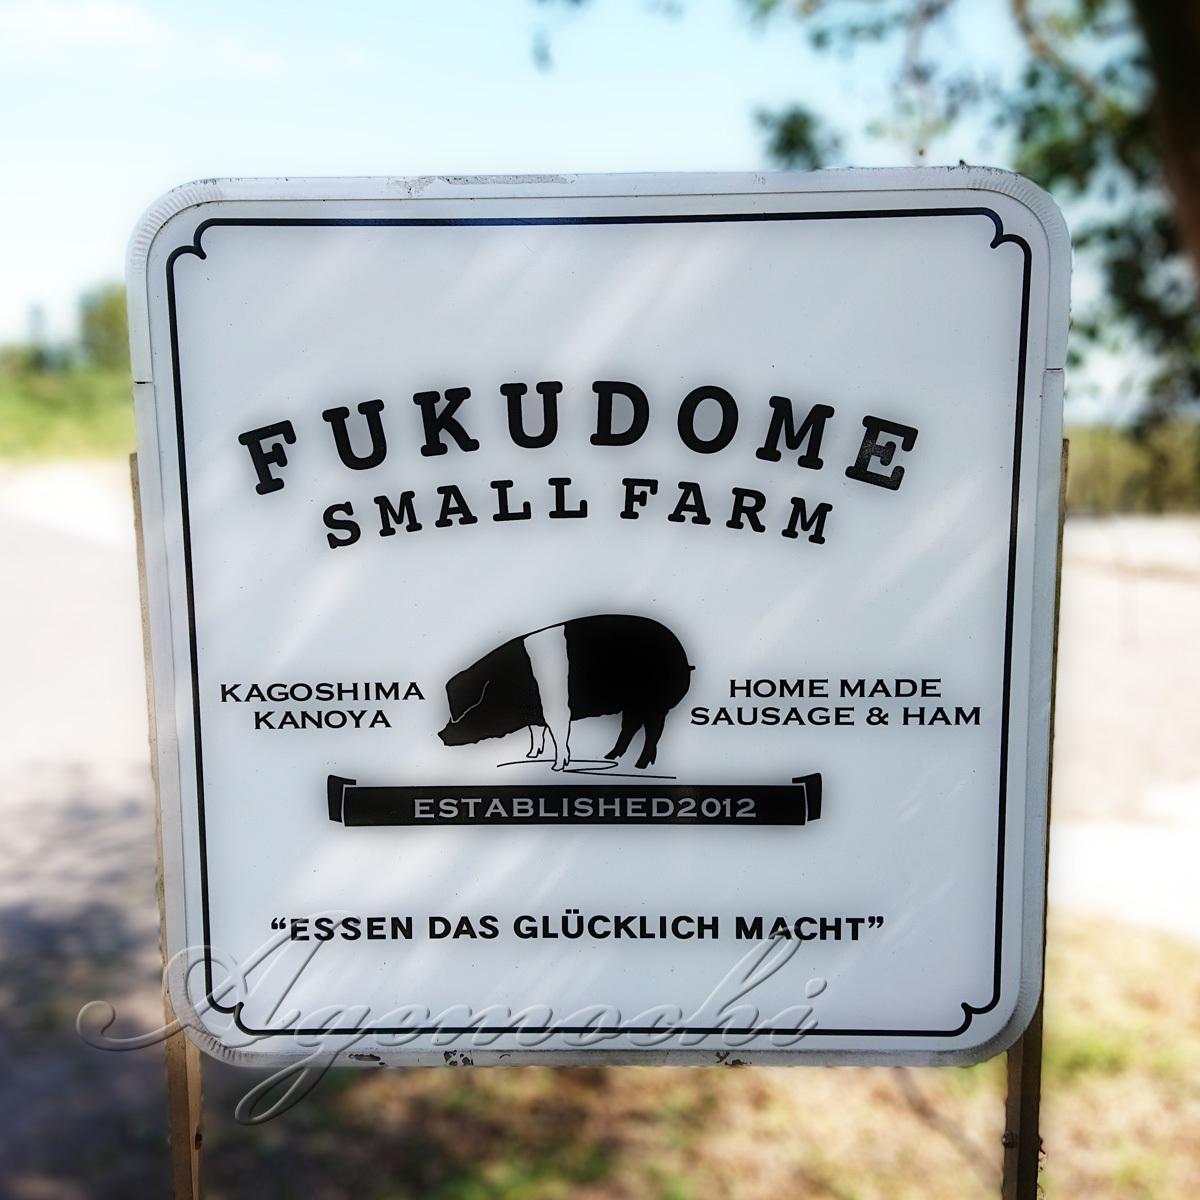 fukudome_shop.jpg